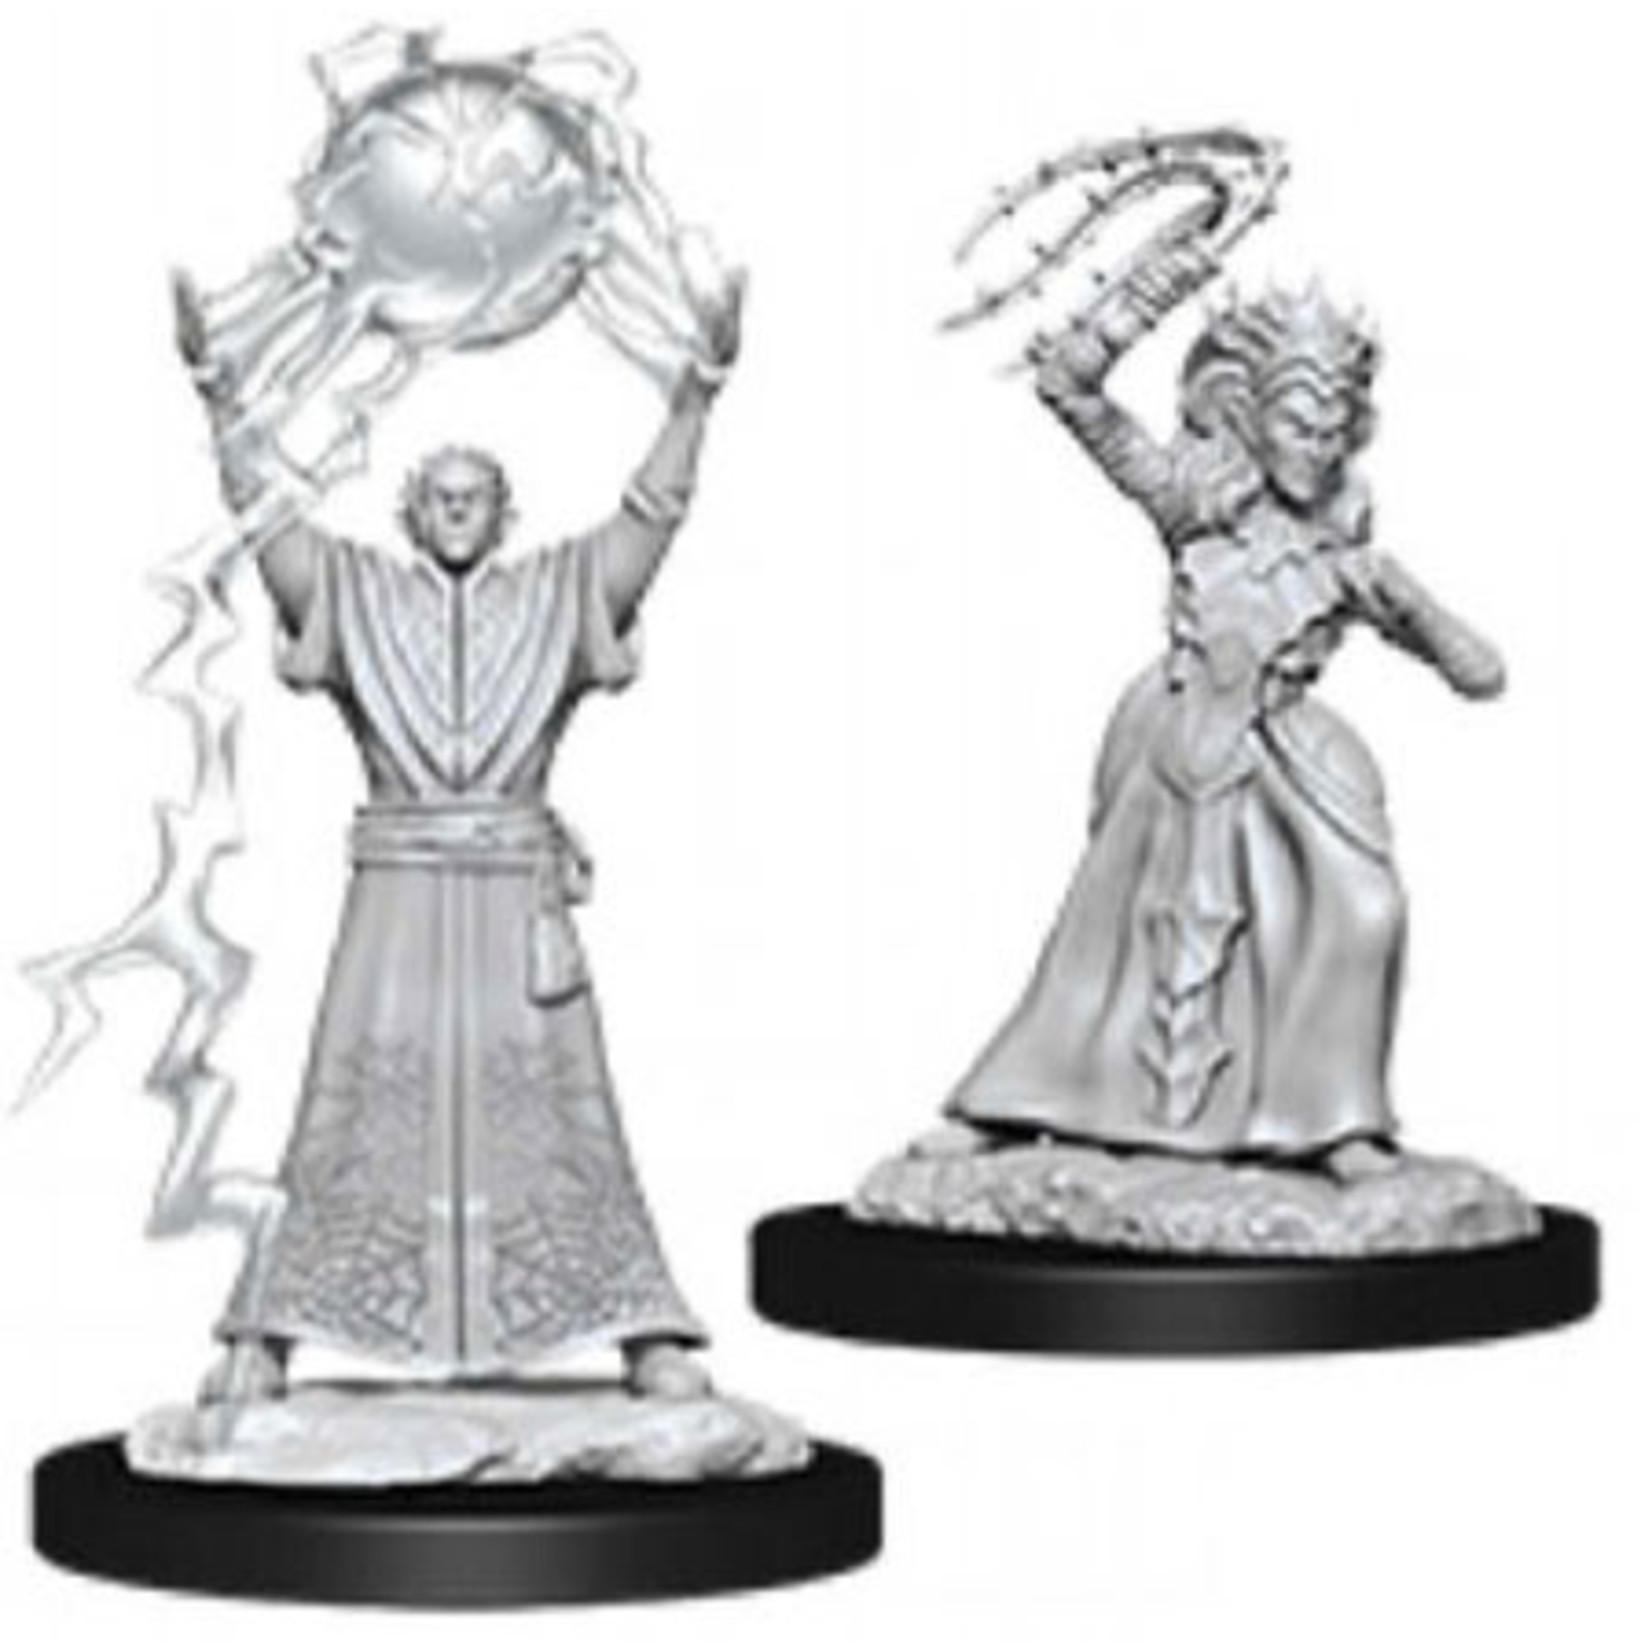 WizKids/Neca 90071 Nolzur's Drow Mage & Drow Priestess